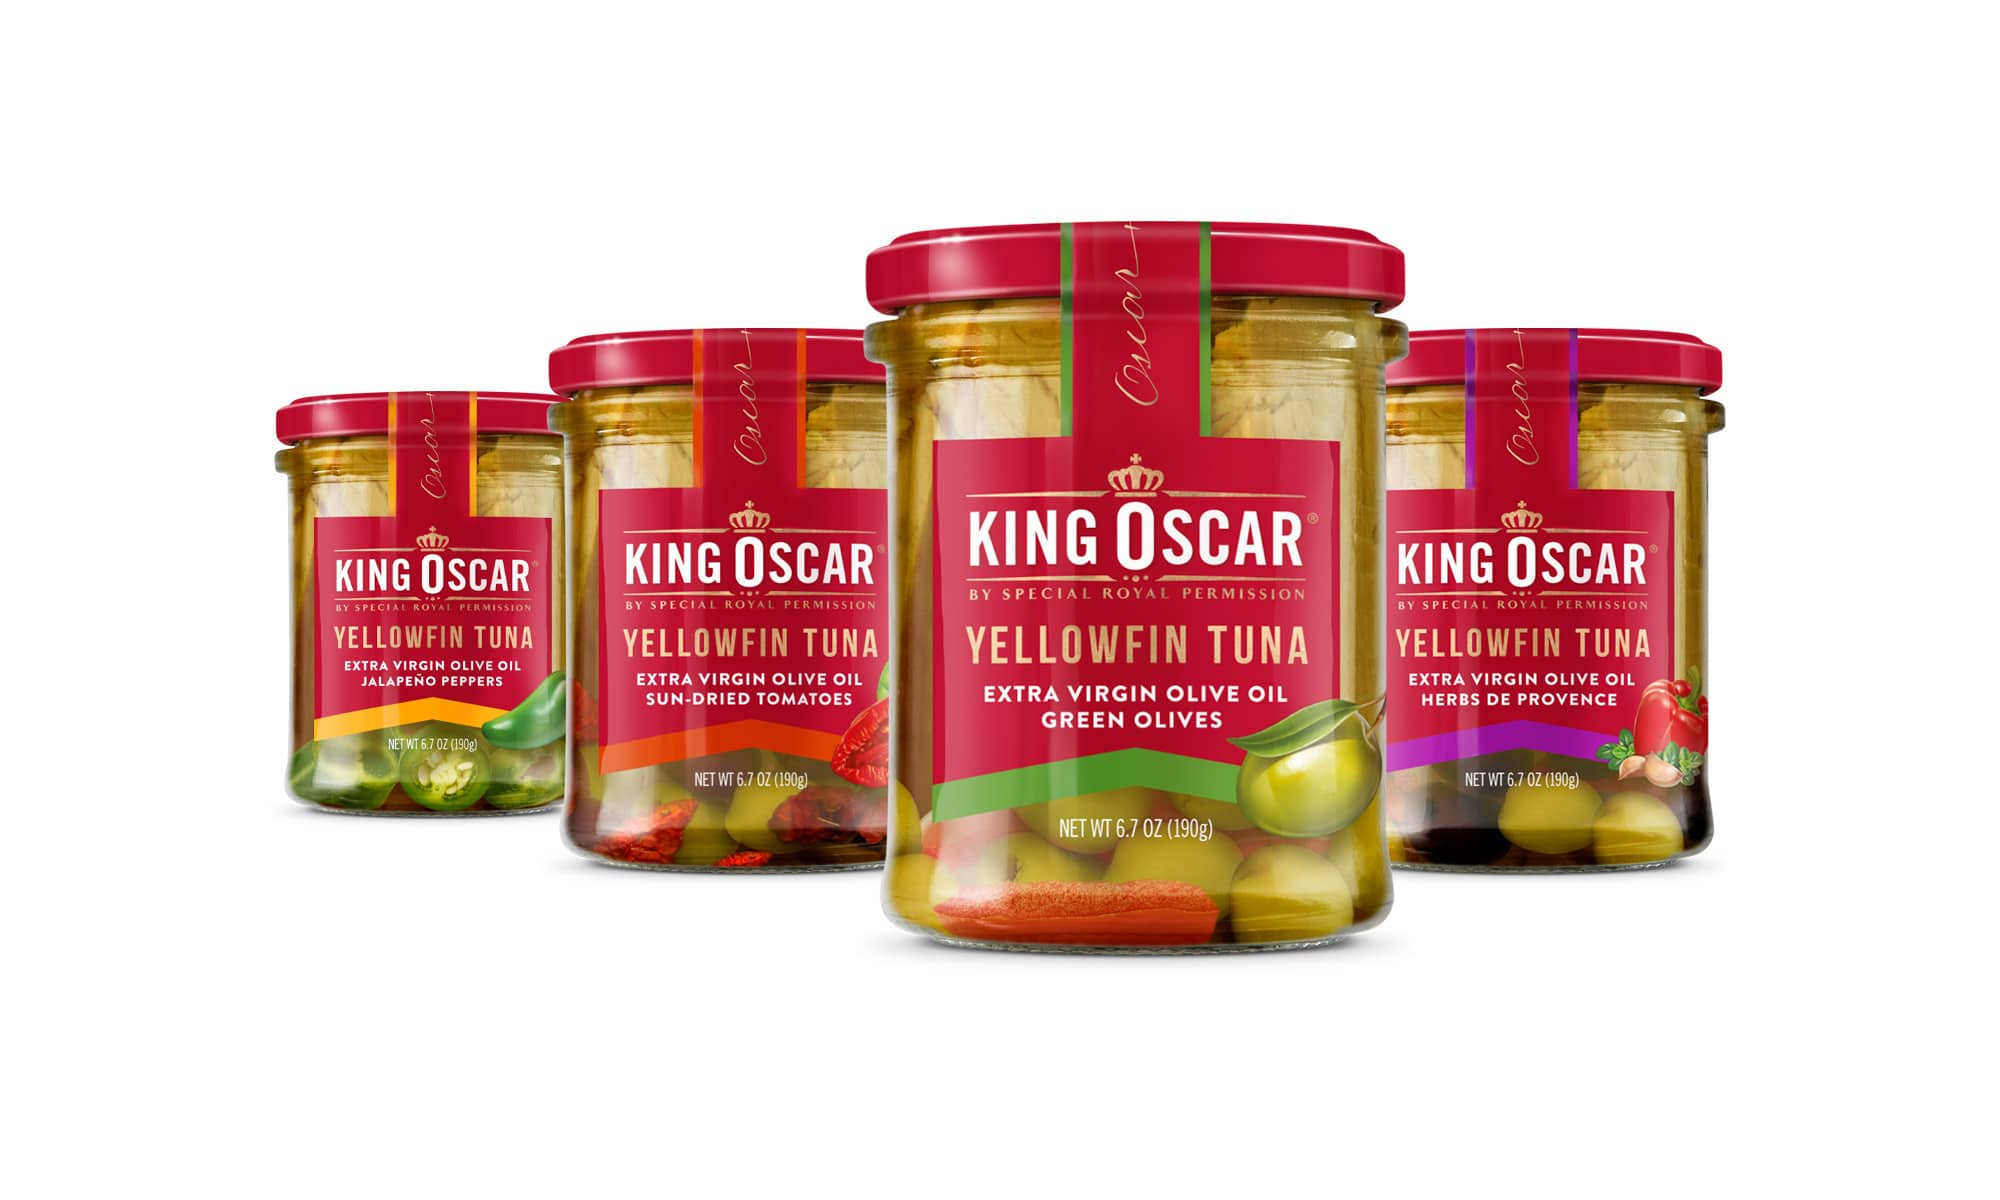 King Oscar Introduces Ultra-Premium Yellowfin Tuna